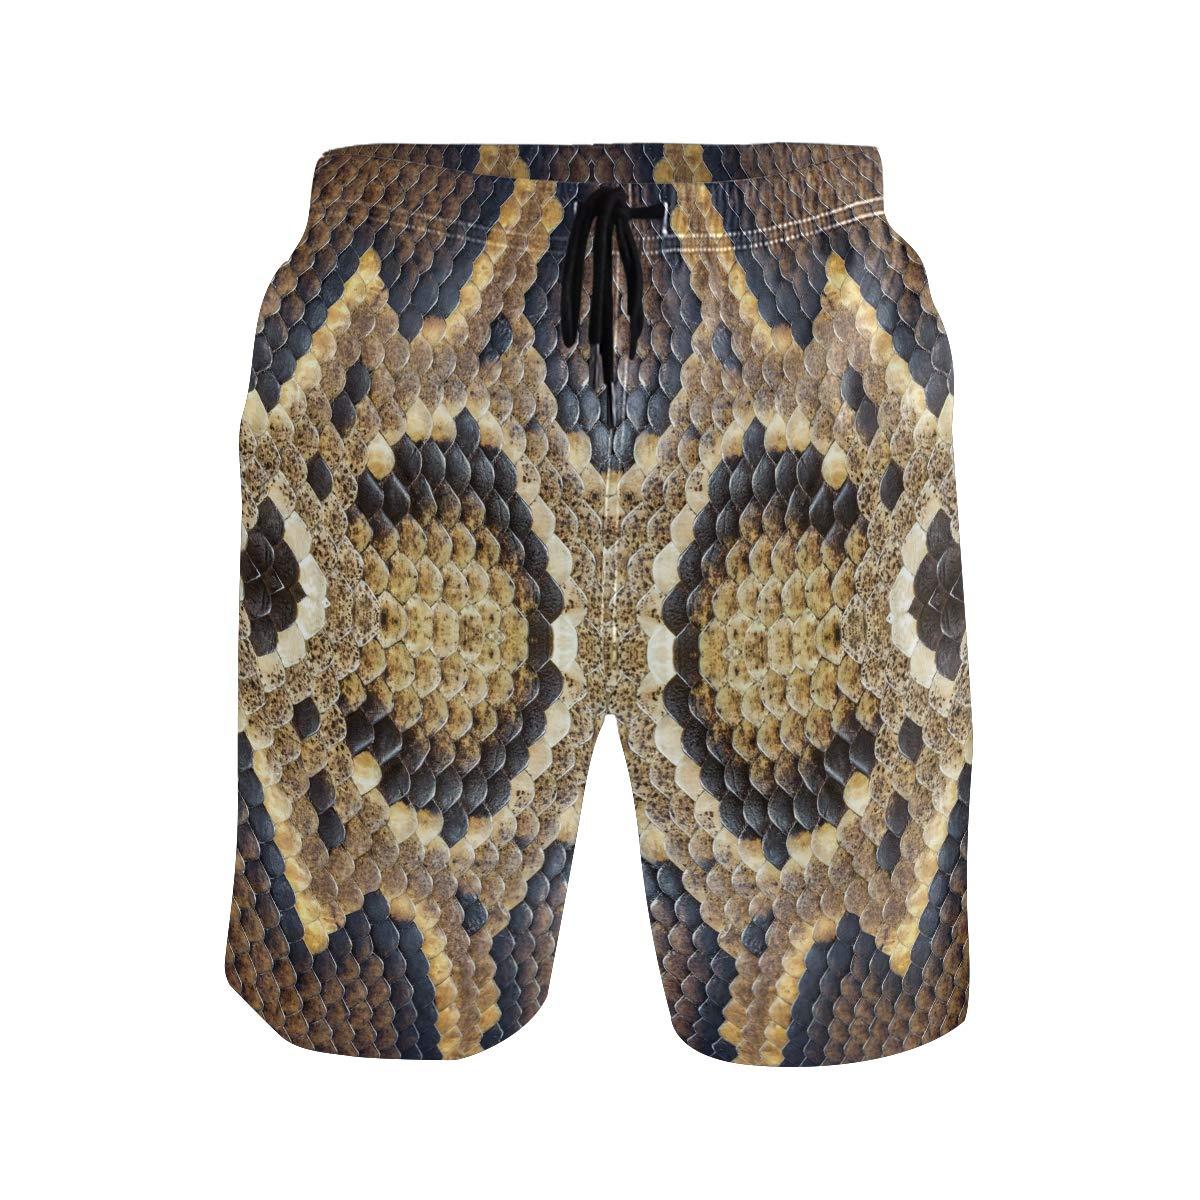 KUWT Mens Swim Trunks Animal Snake Print Quick Dry Beach Shorts Summer Surf Board Shorts